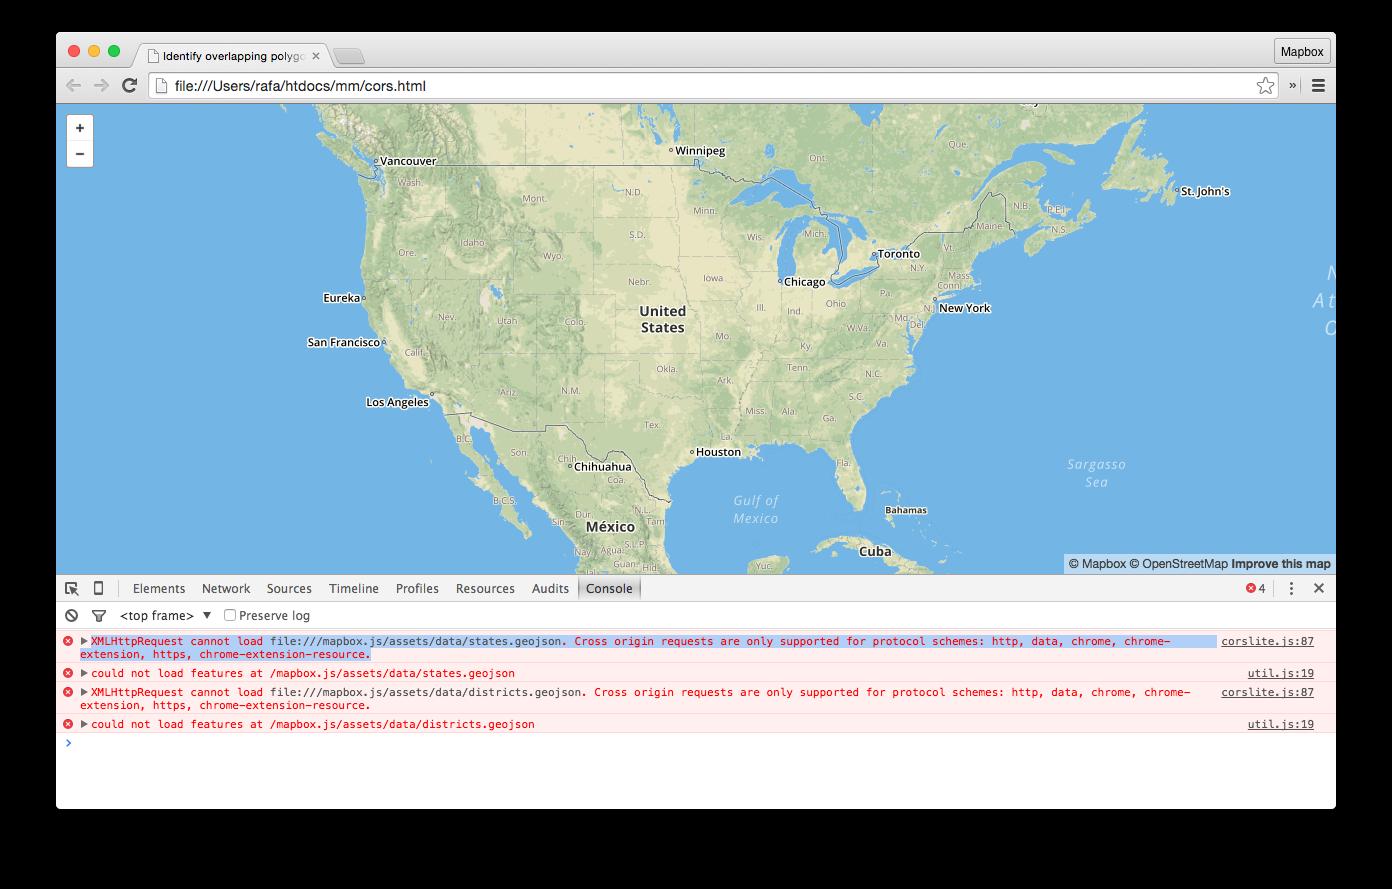 CORS errors | Mapbox